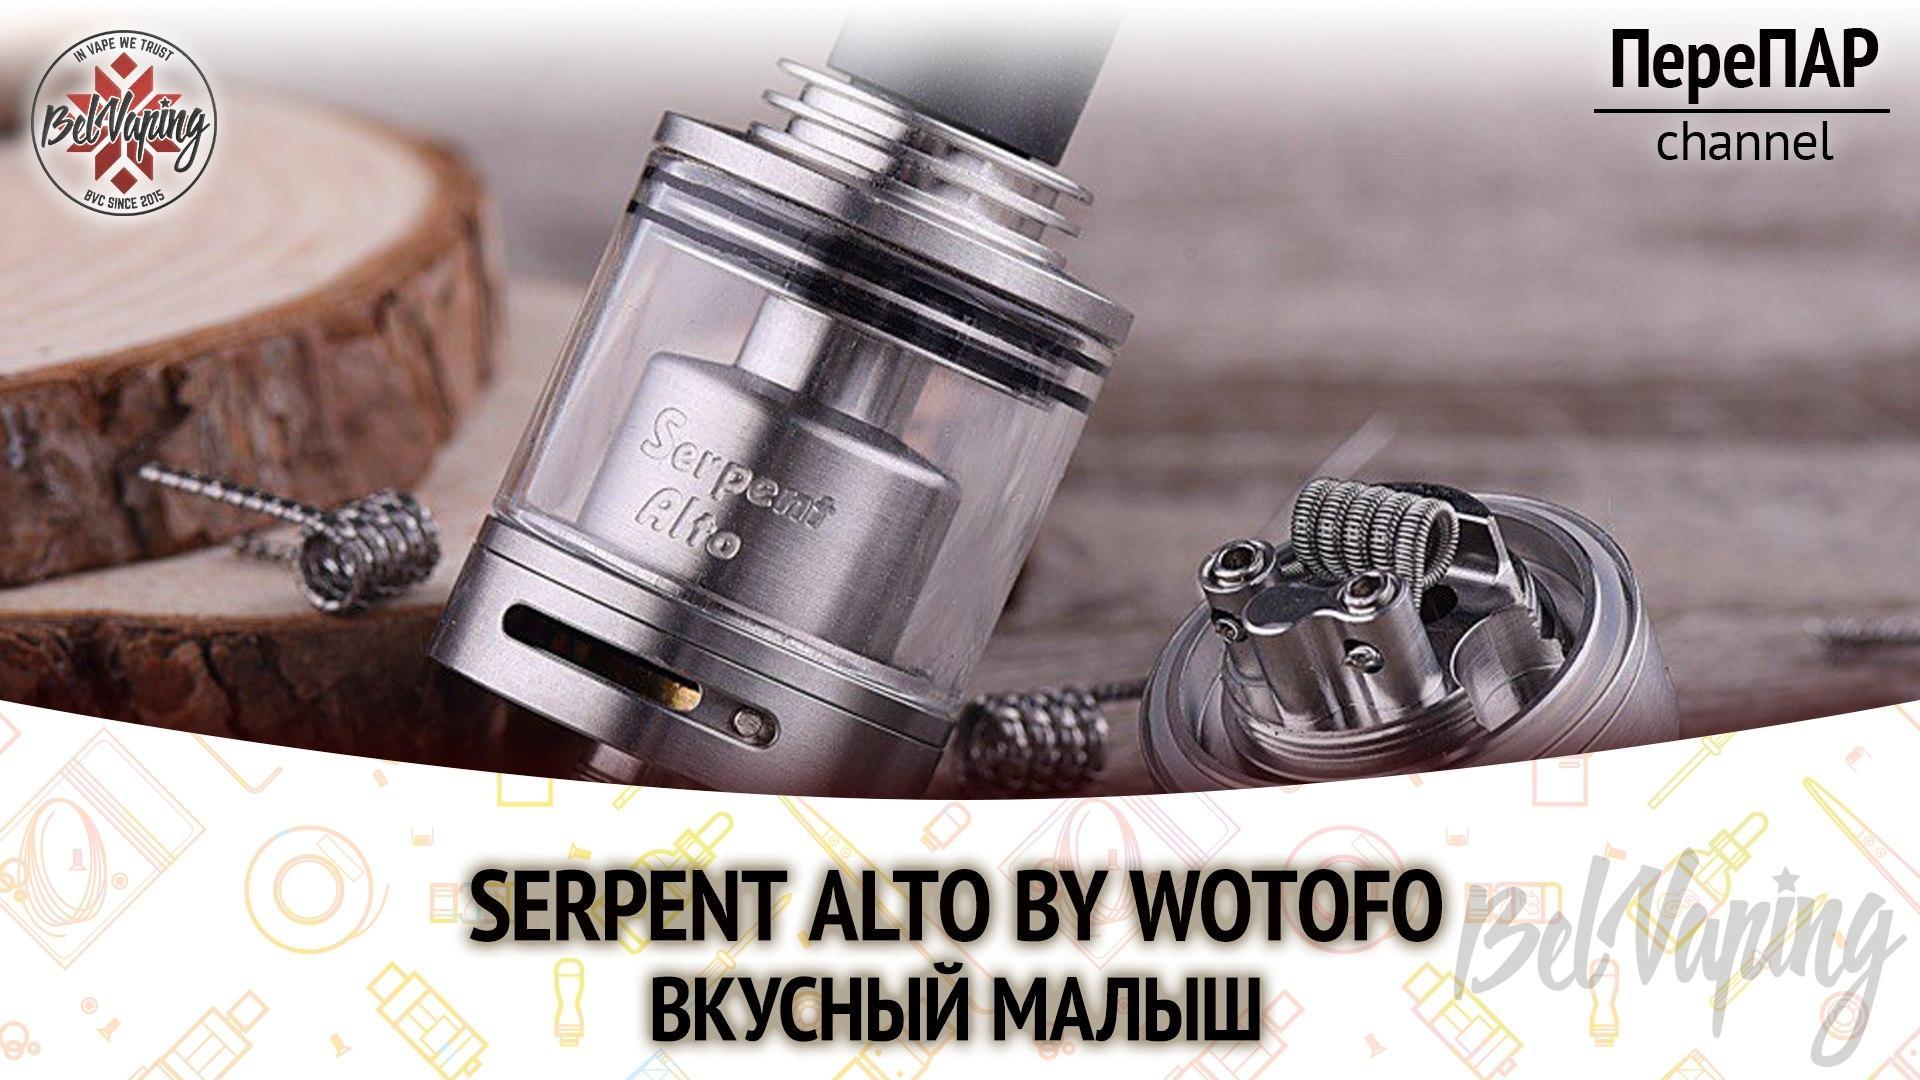 Обзор бака Serpent Alto компании Wotofo